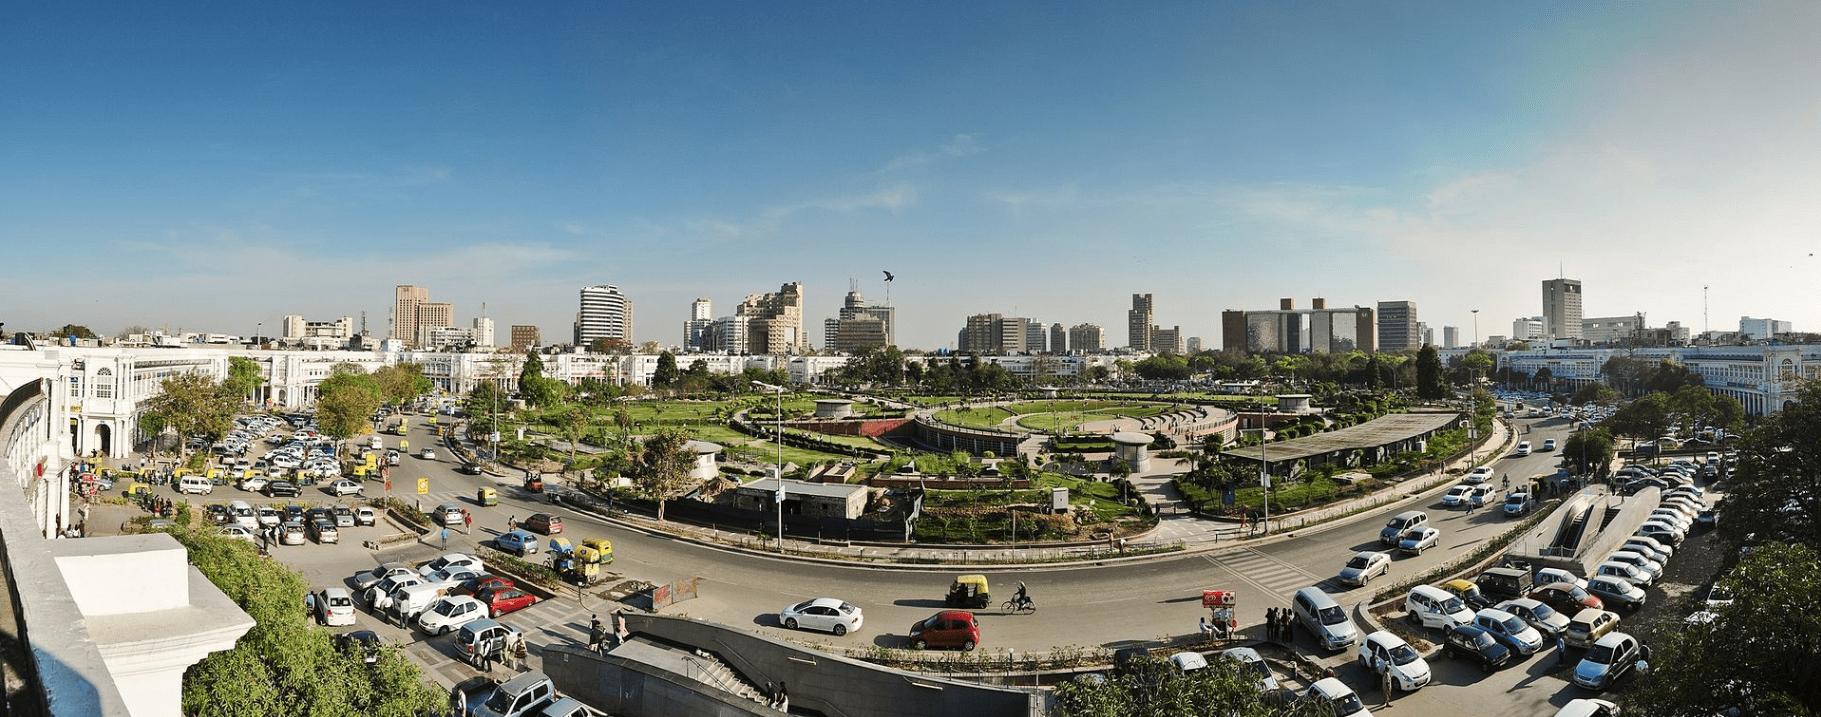 Hire a car and driver in New Delhi